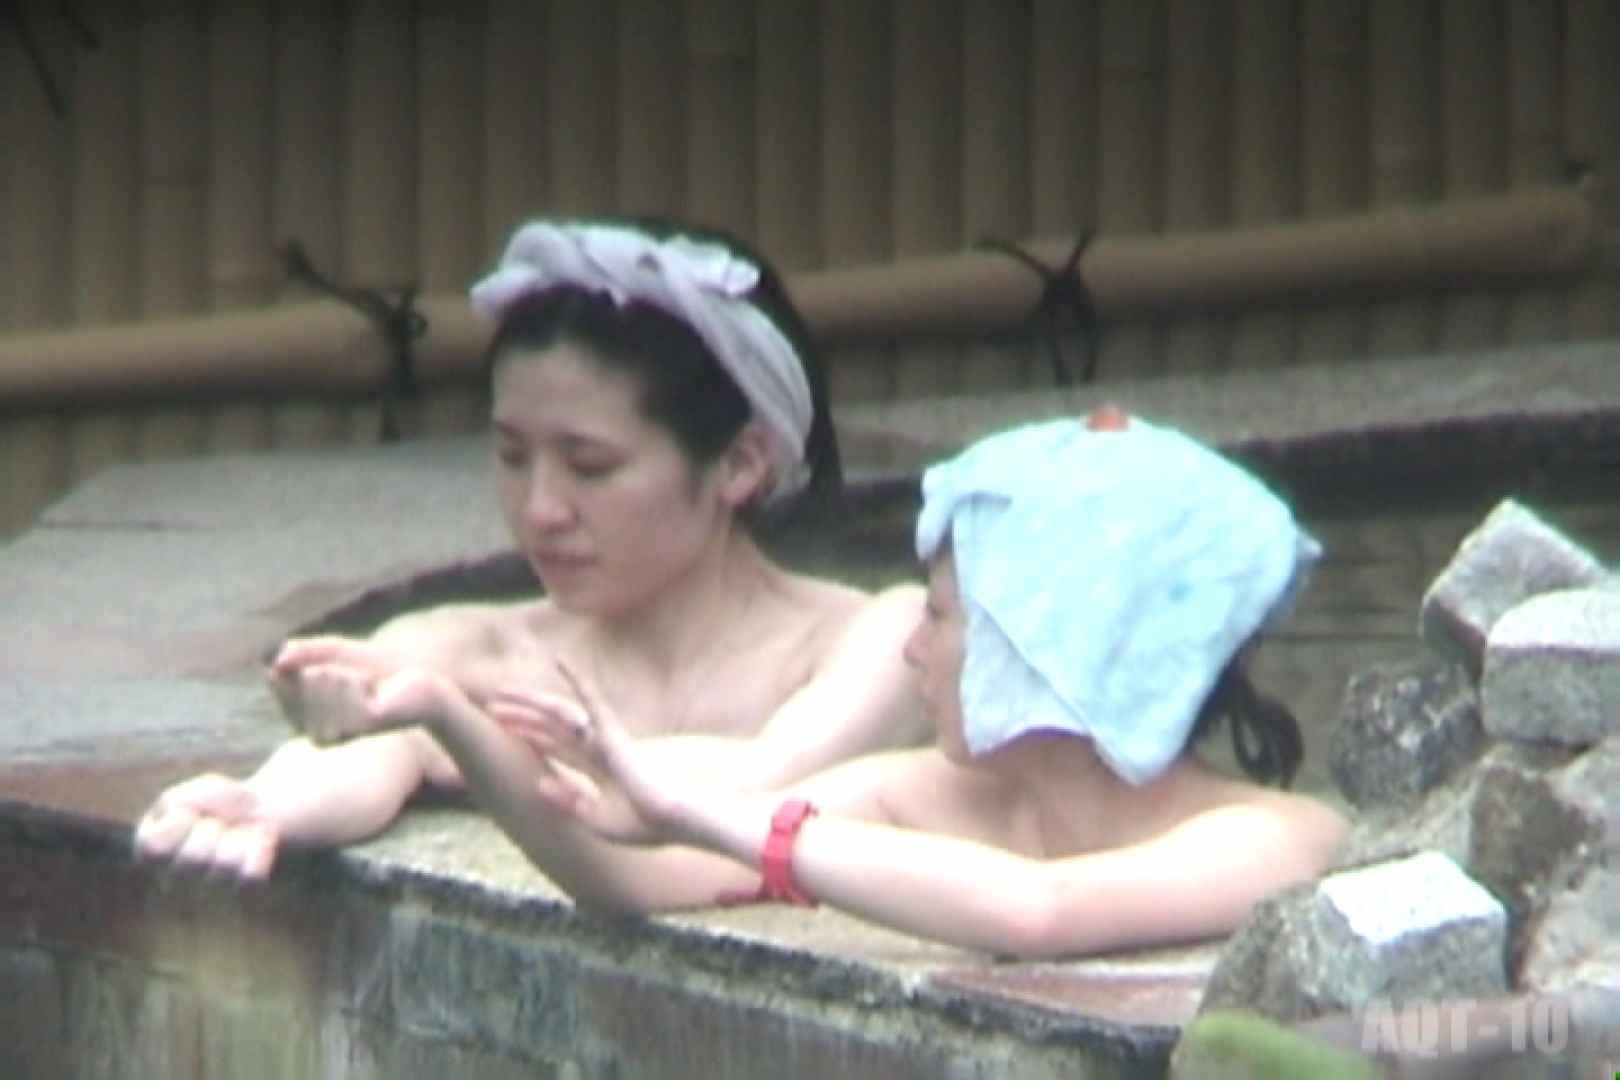 Aquaな露天風呂Vol.793 盗撮映像  72Pix 36